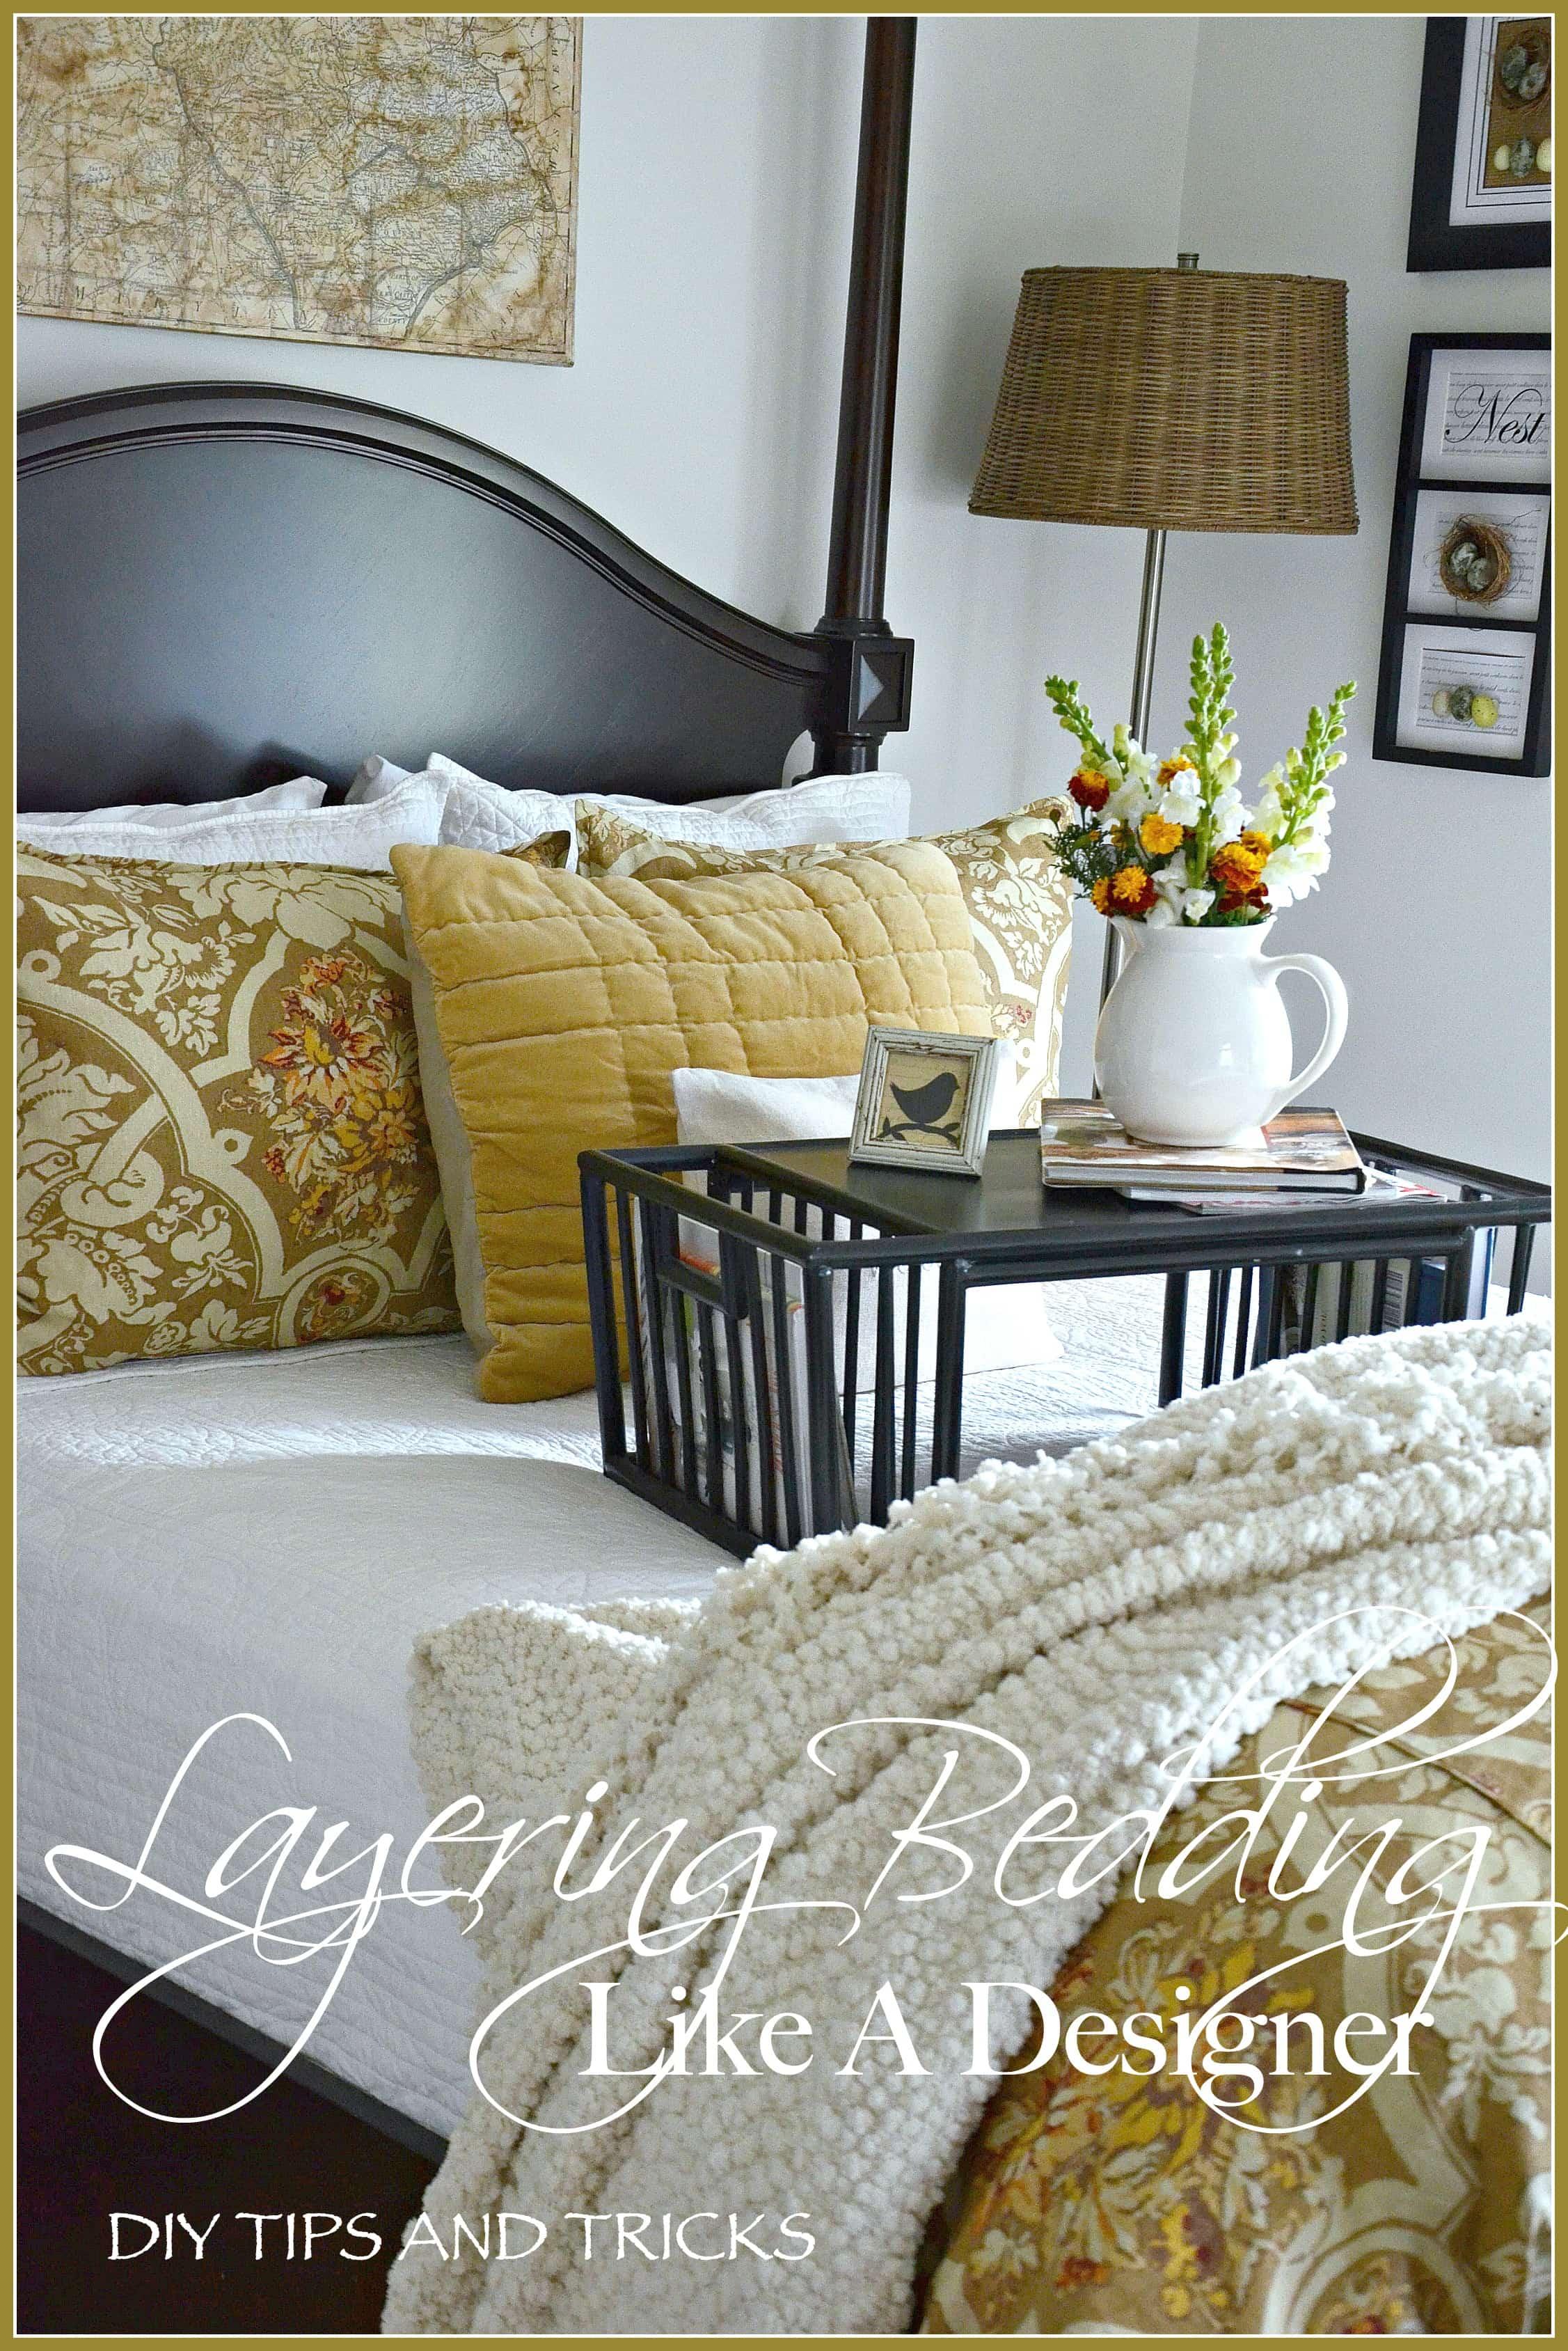 LAYERING BEDDING LIKE A DESIGNER-stonegableblog.com